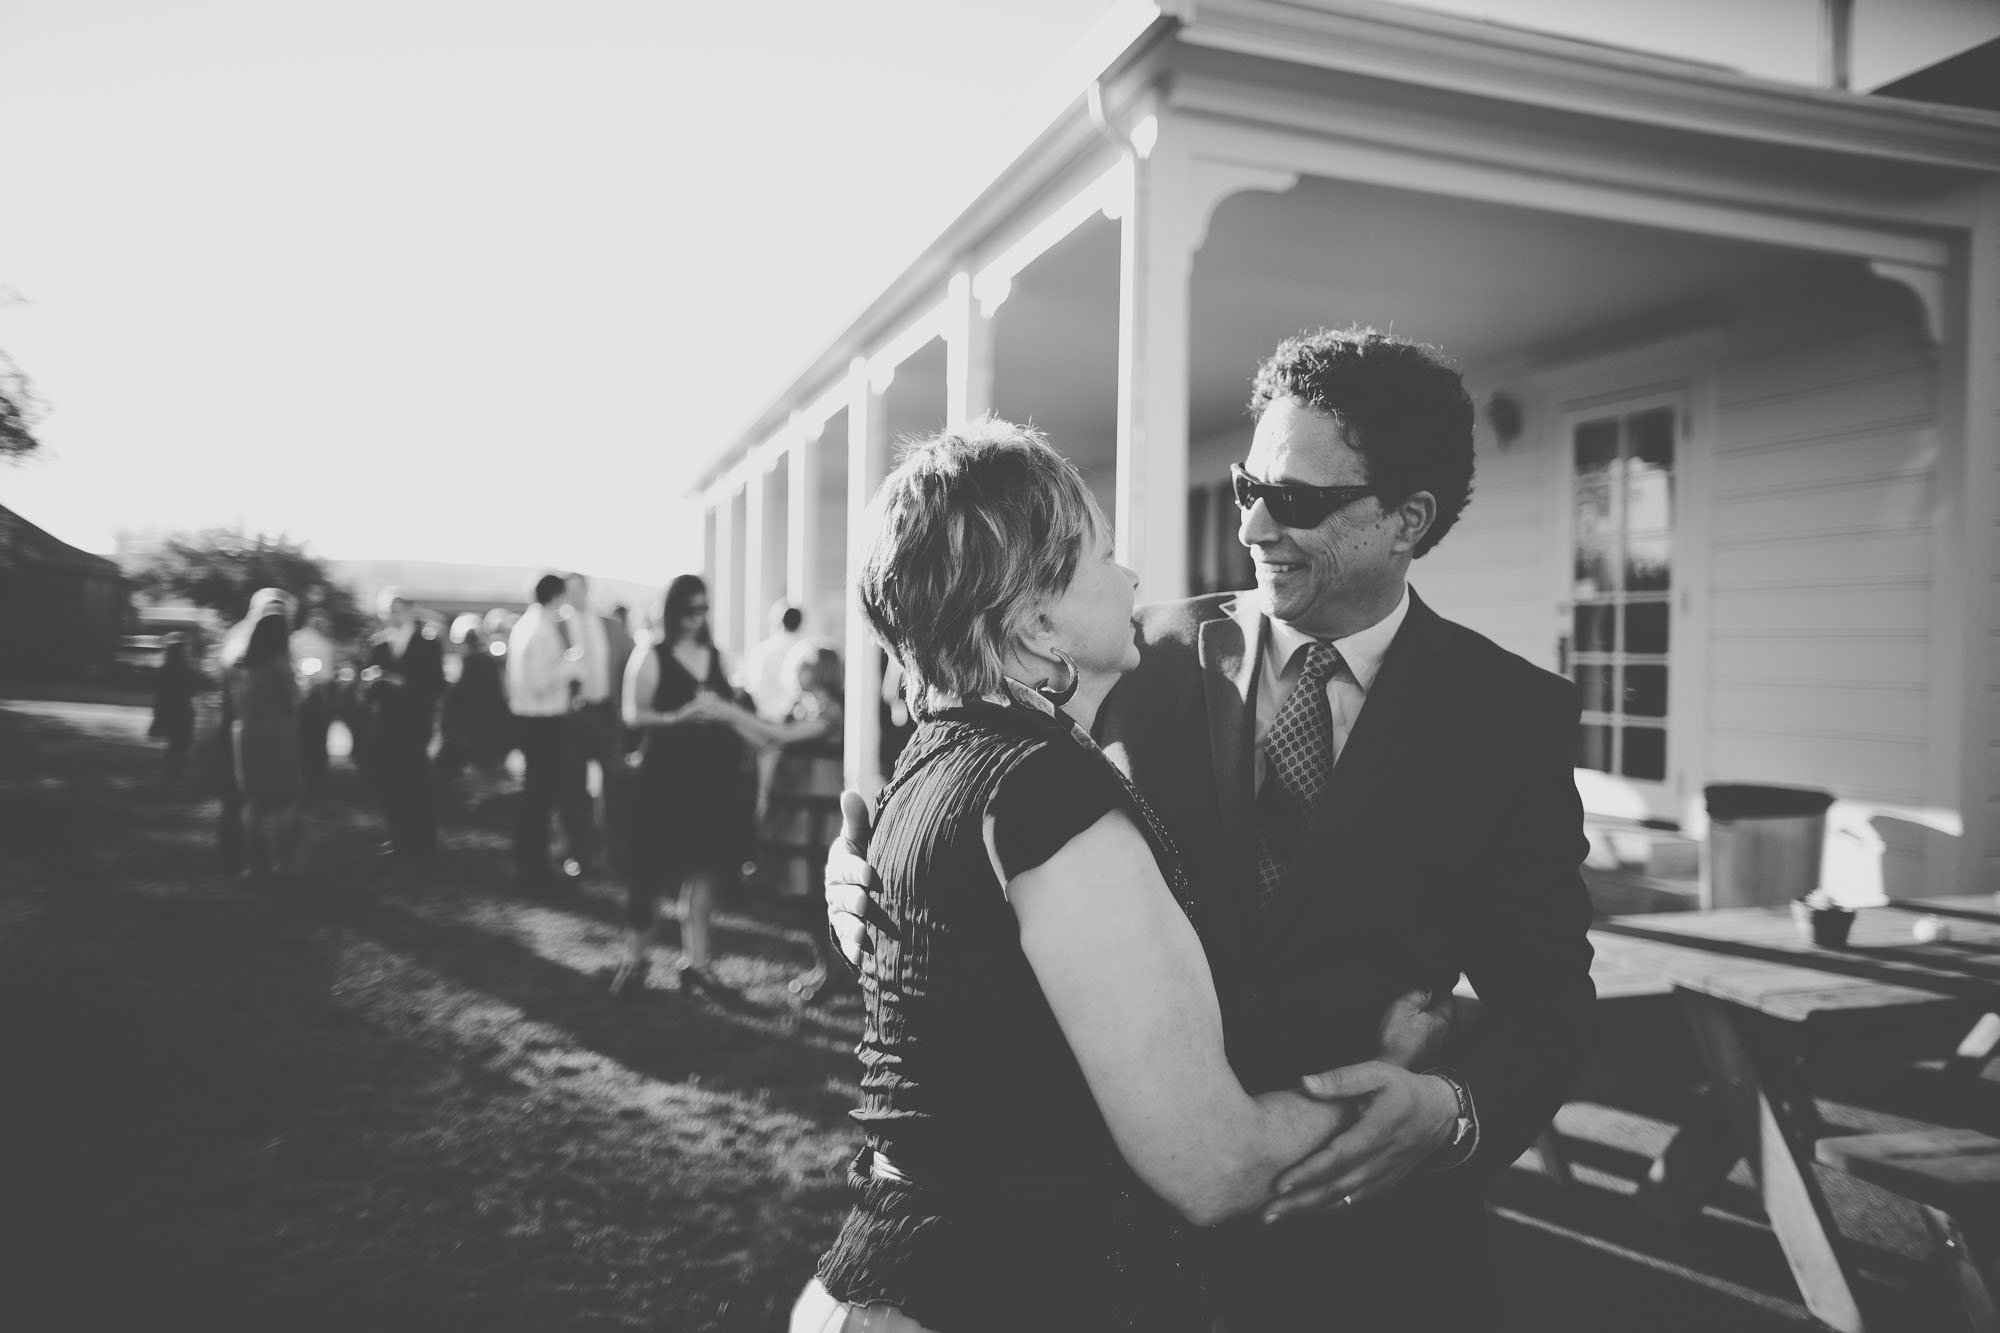 Gretchen_Gause_Petaluma_Olympias_Valley_Wedding_Photo-174.jpg